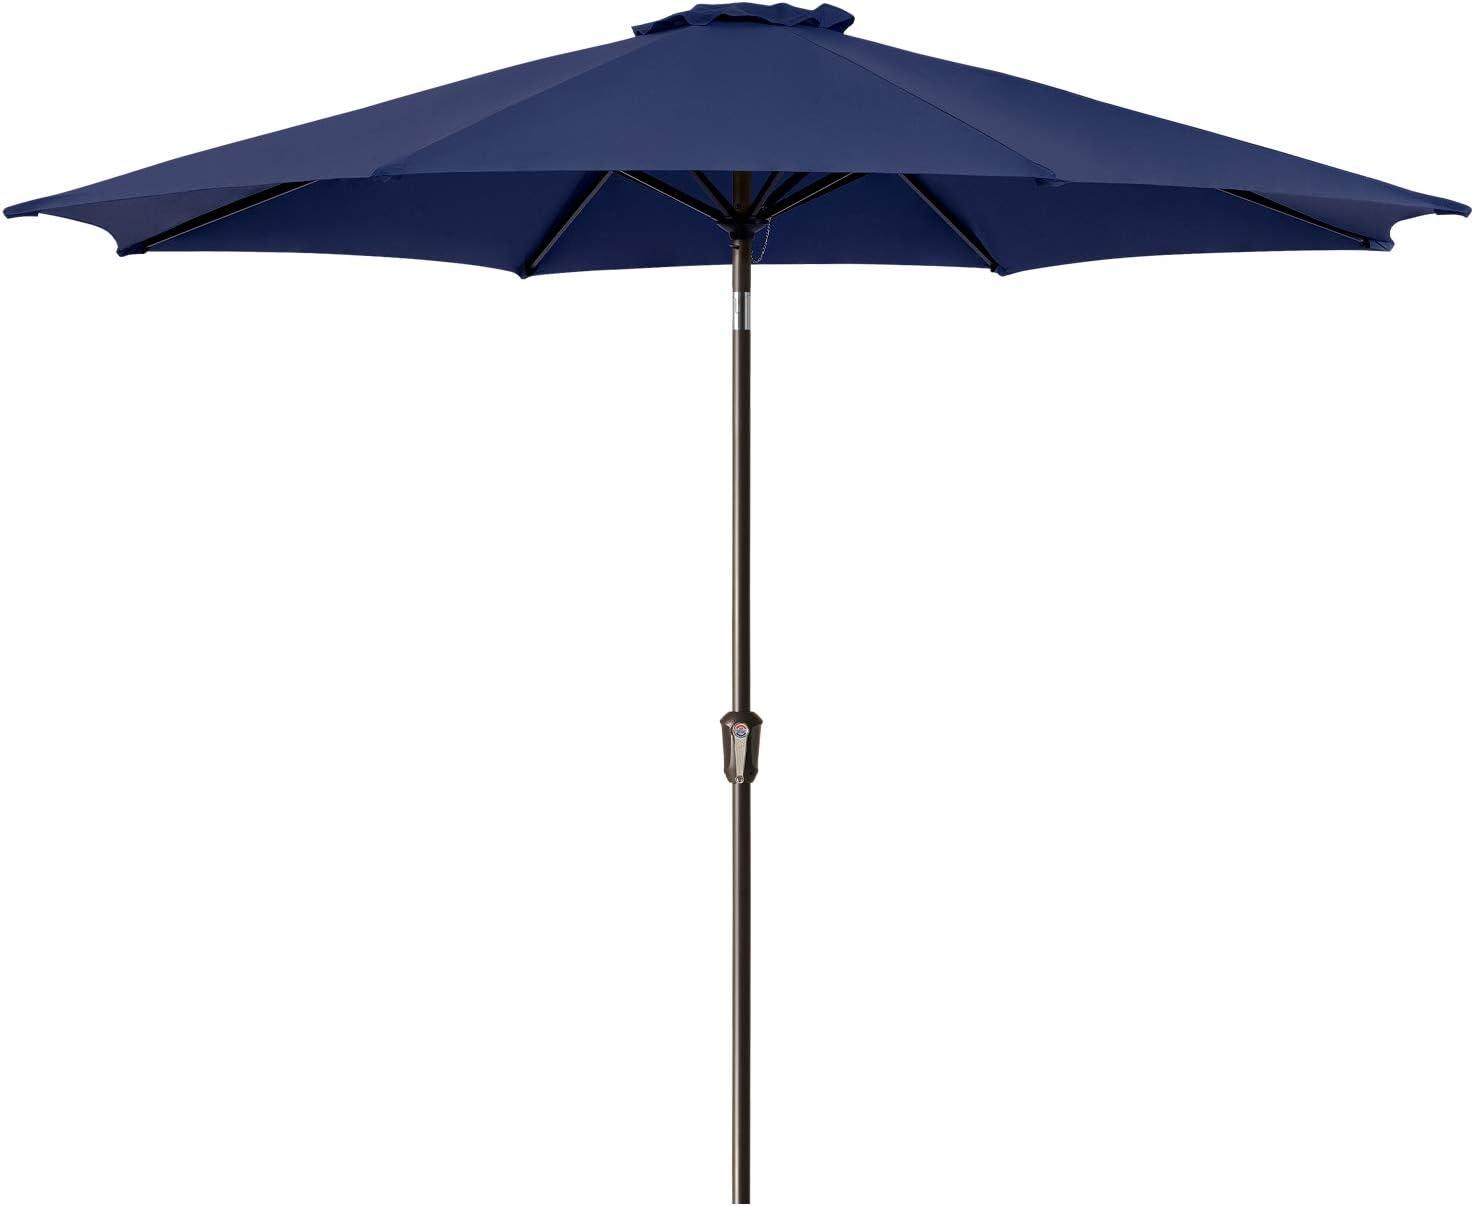 Ralawen 9 FT Choice Patio Umbrella Market Umbrellas Max 89% OFF Outdoor with Table